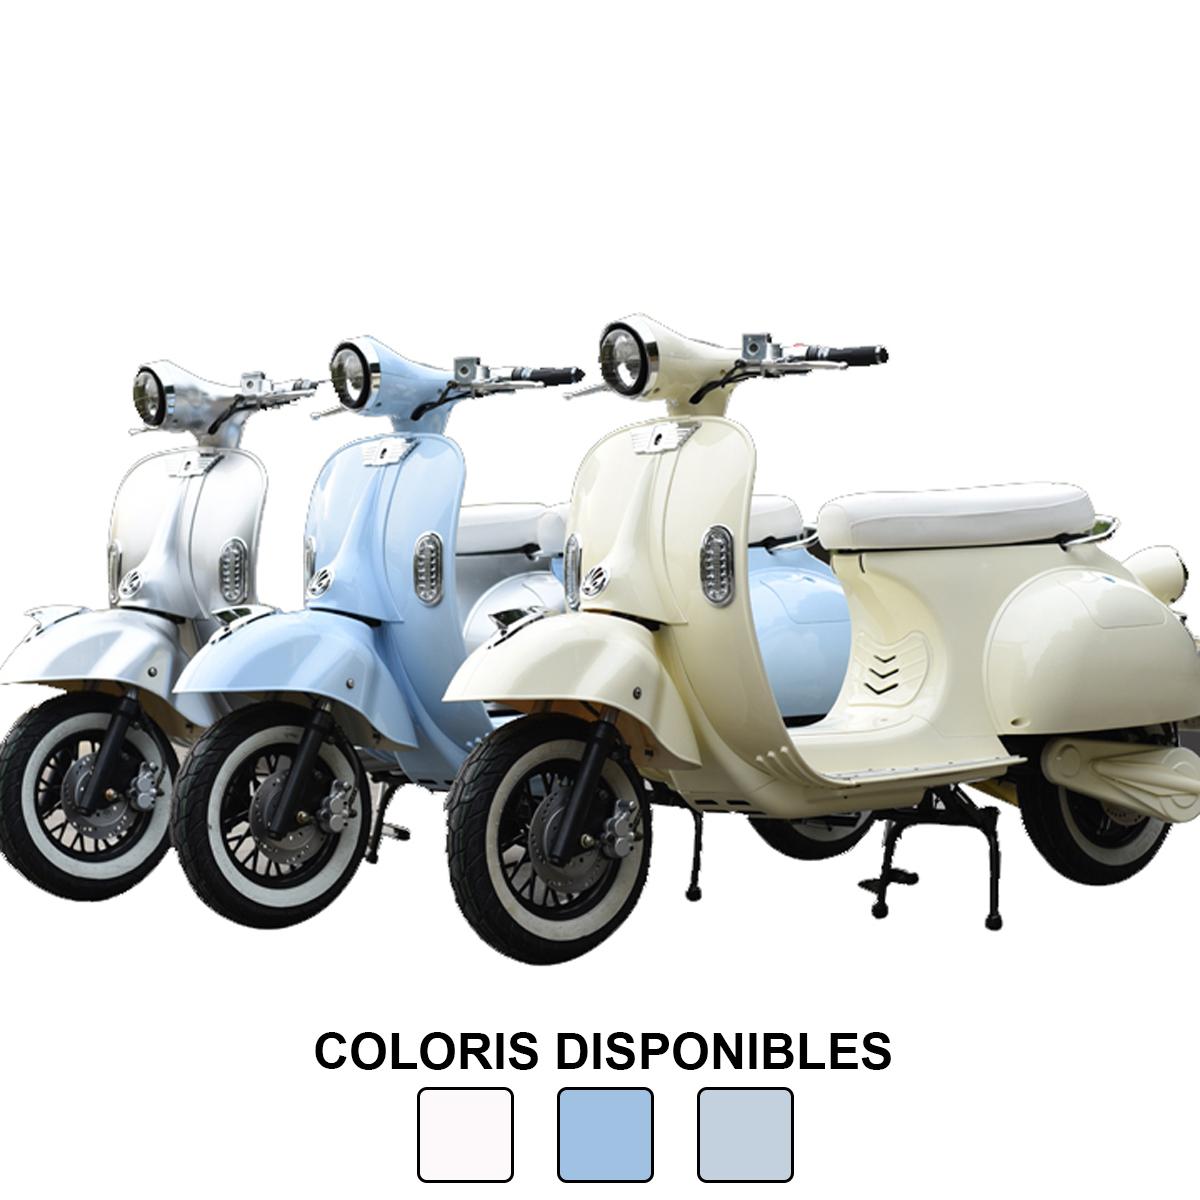 Scooter Lycke Retro80 - 125cc, vitesse 85km/h